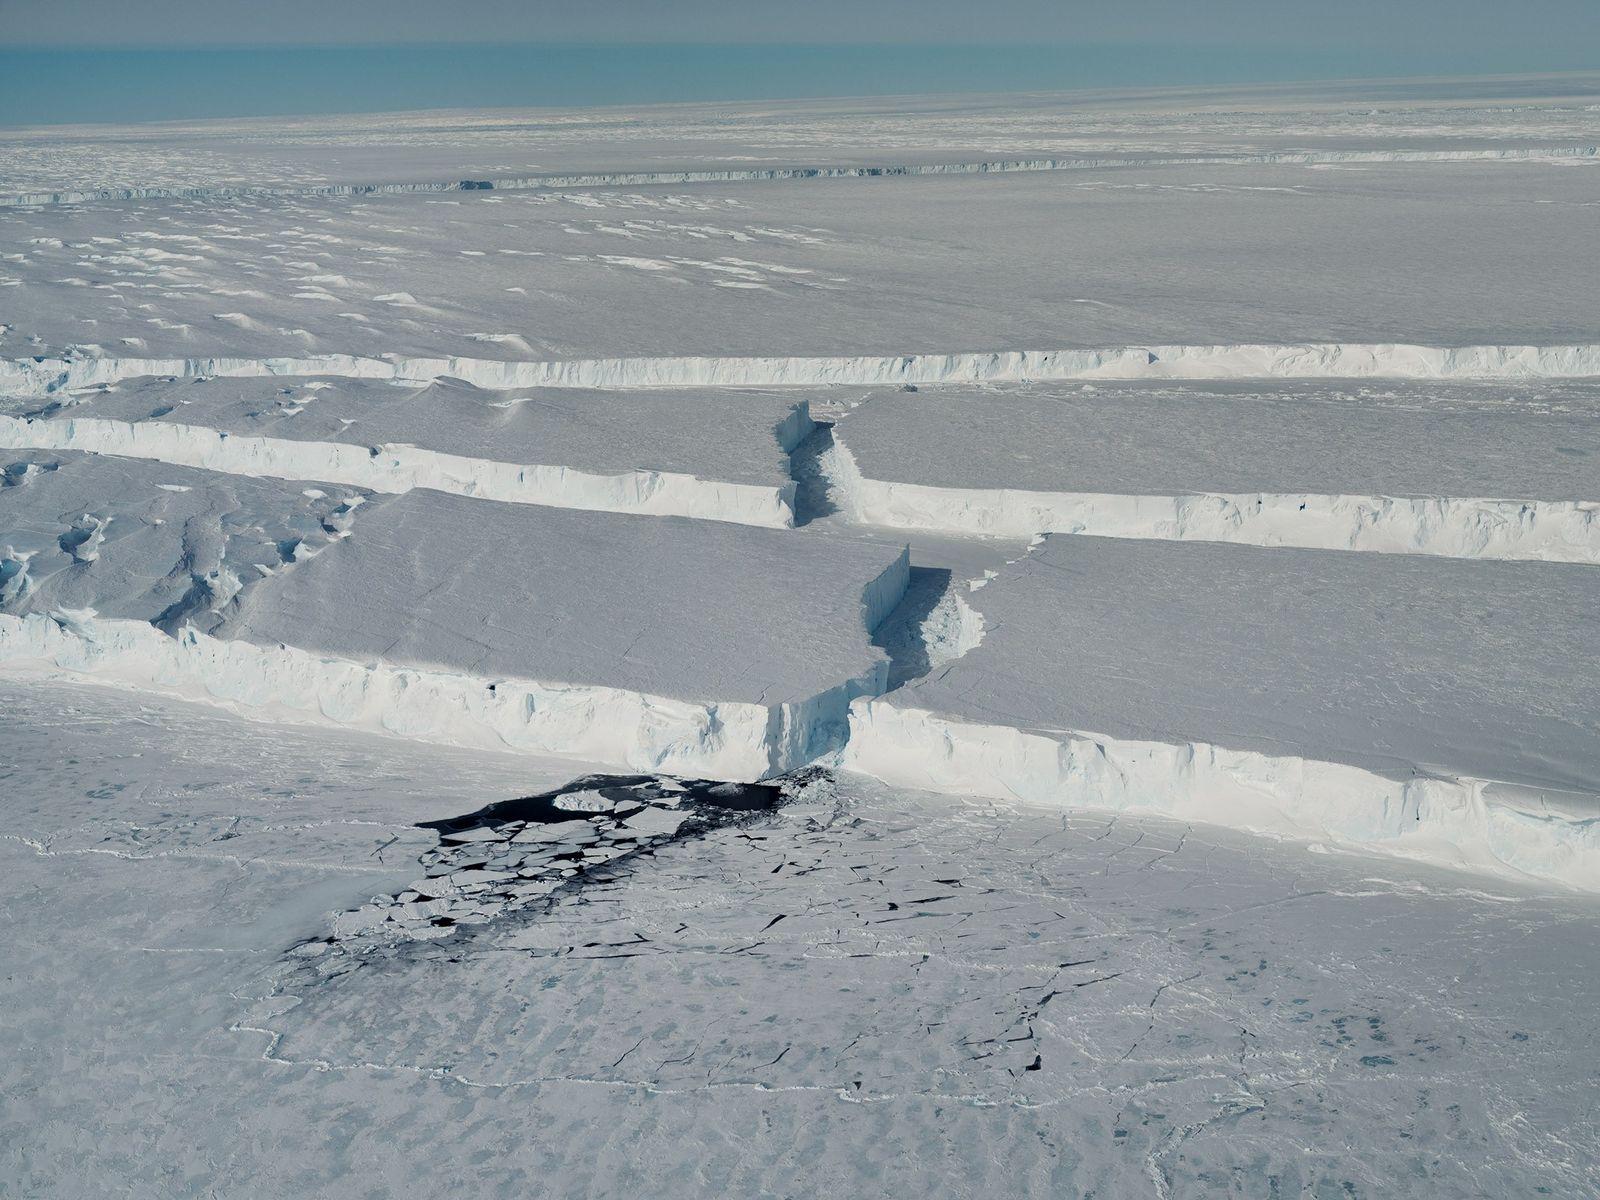 Exclusive photos: A giant iceberg breaks off Antarctica